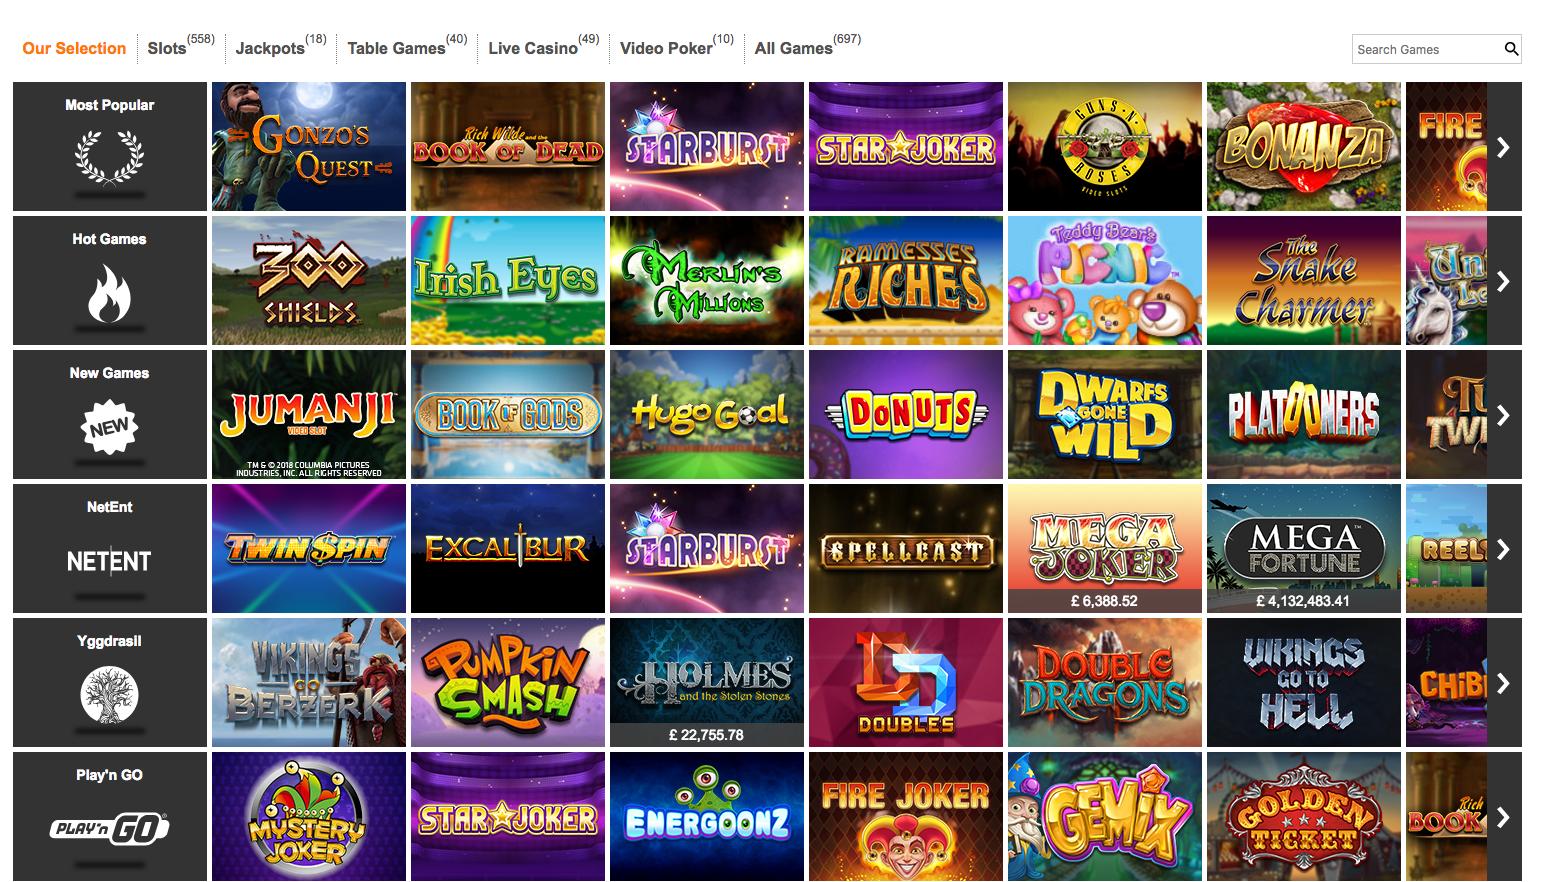 Expekt Casino Games Selection